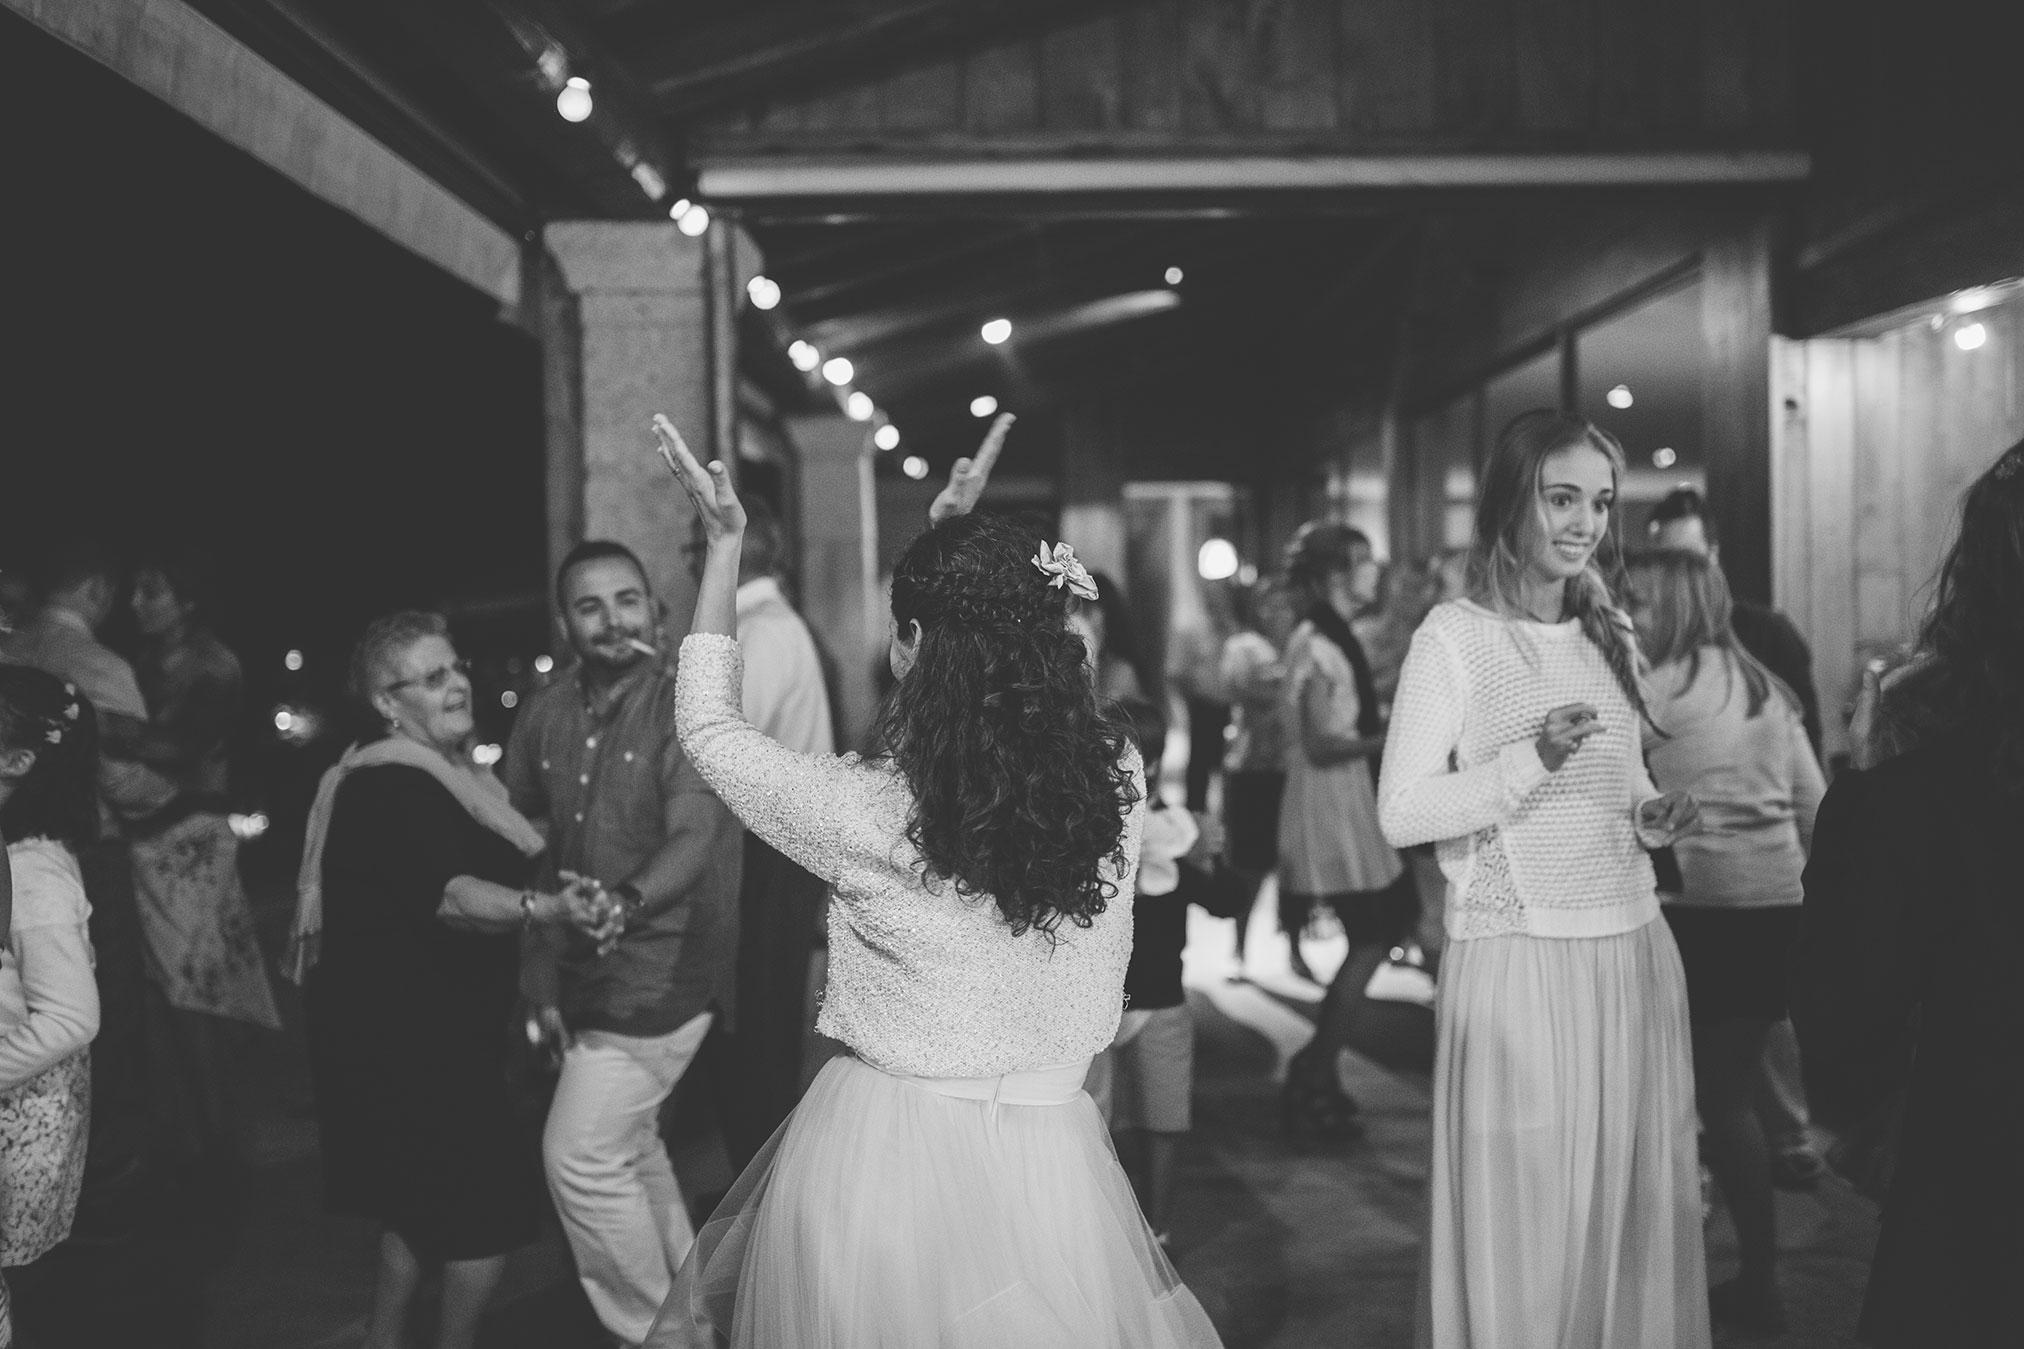 Wedding Photographer Graciela Vilagudin Dublin Galicia 891.jpg